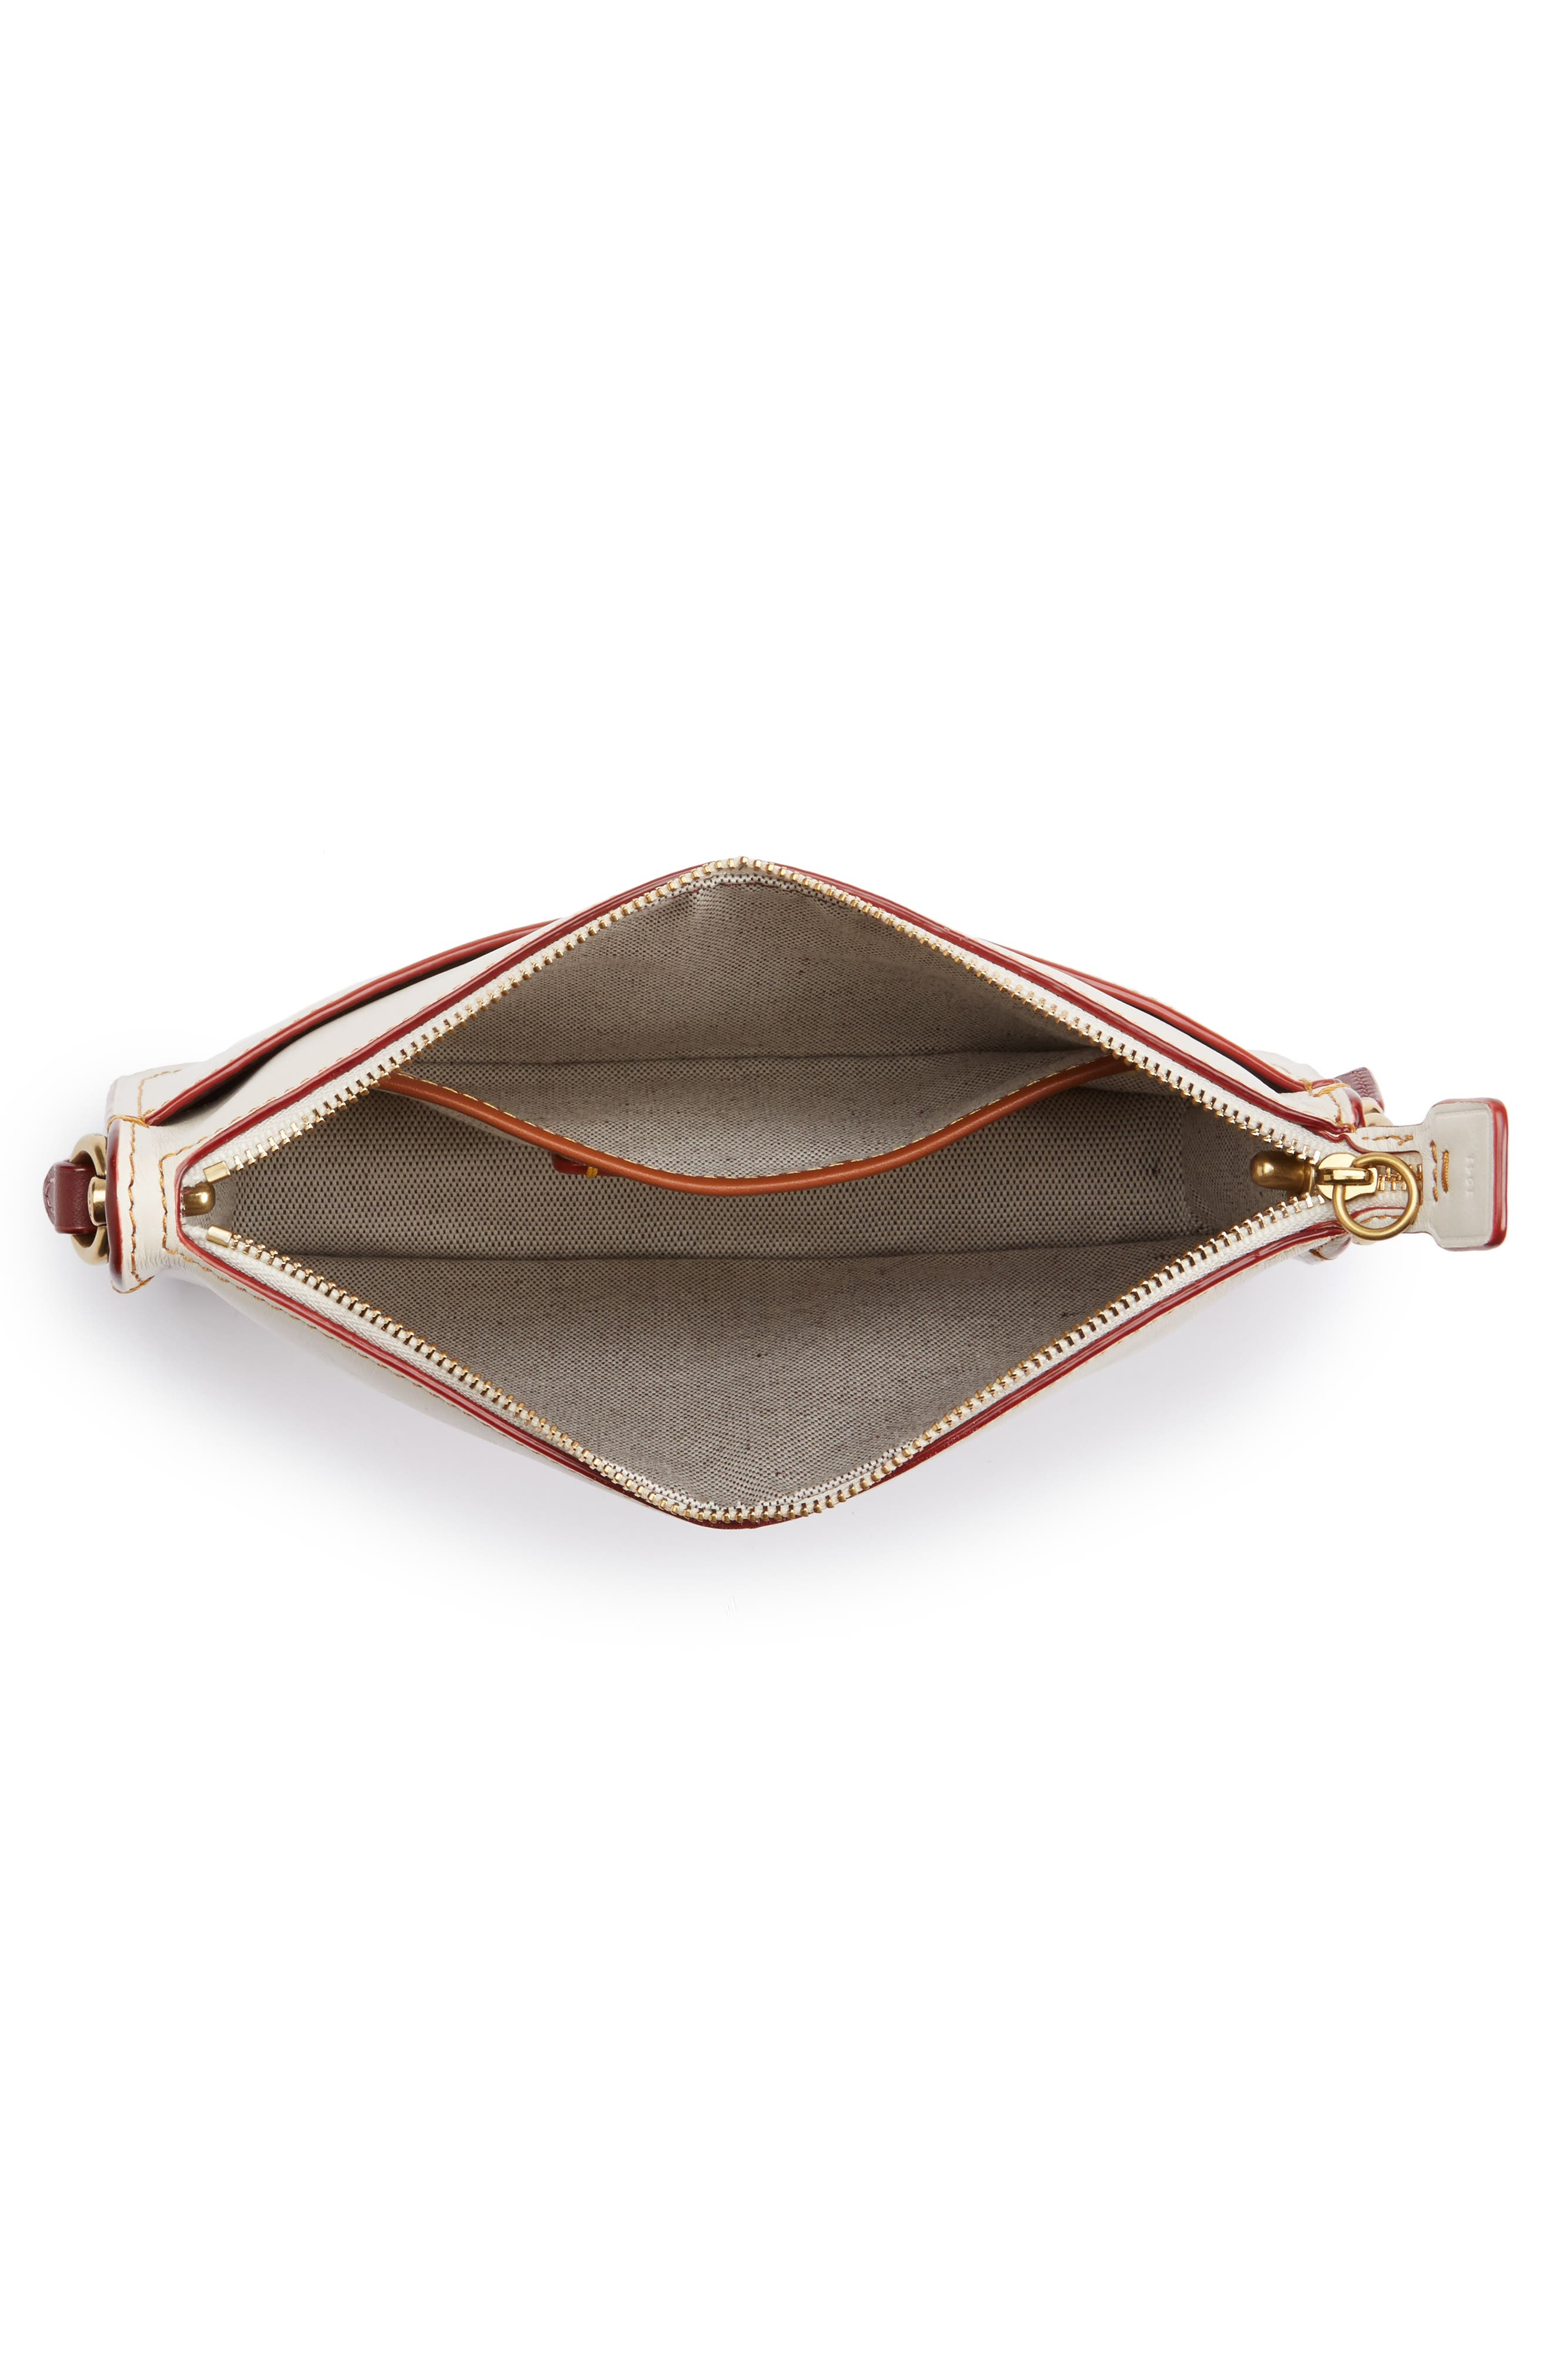 Colorblock Soho Leather Crossbody Bag,                             Alternate thumbnail 4, color,                             250